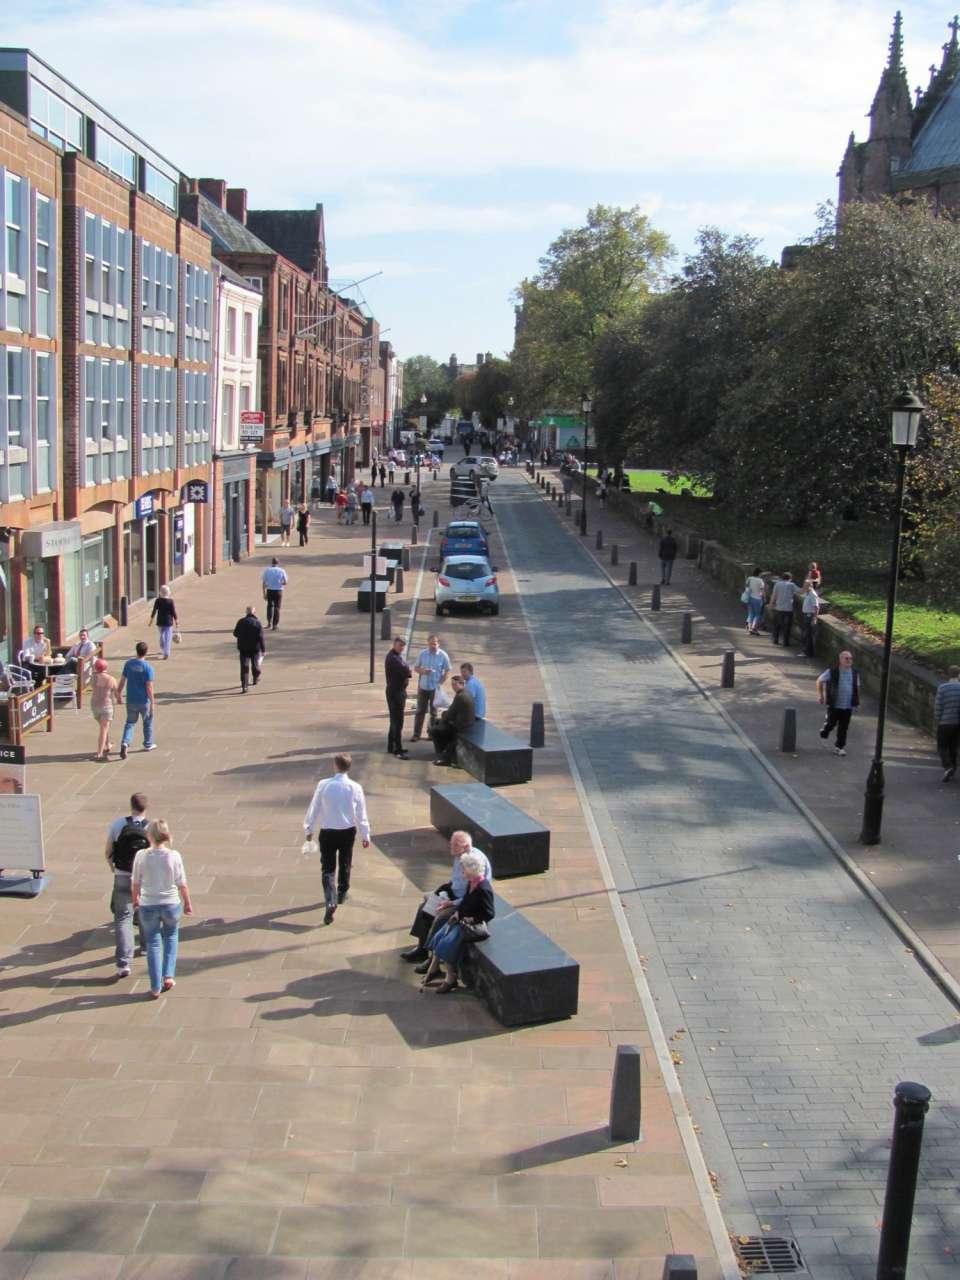 Urban Design Group Award nomination for Carlisle's city centre